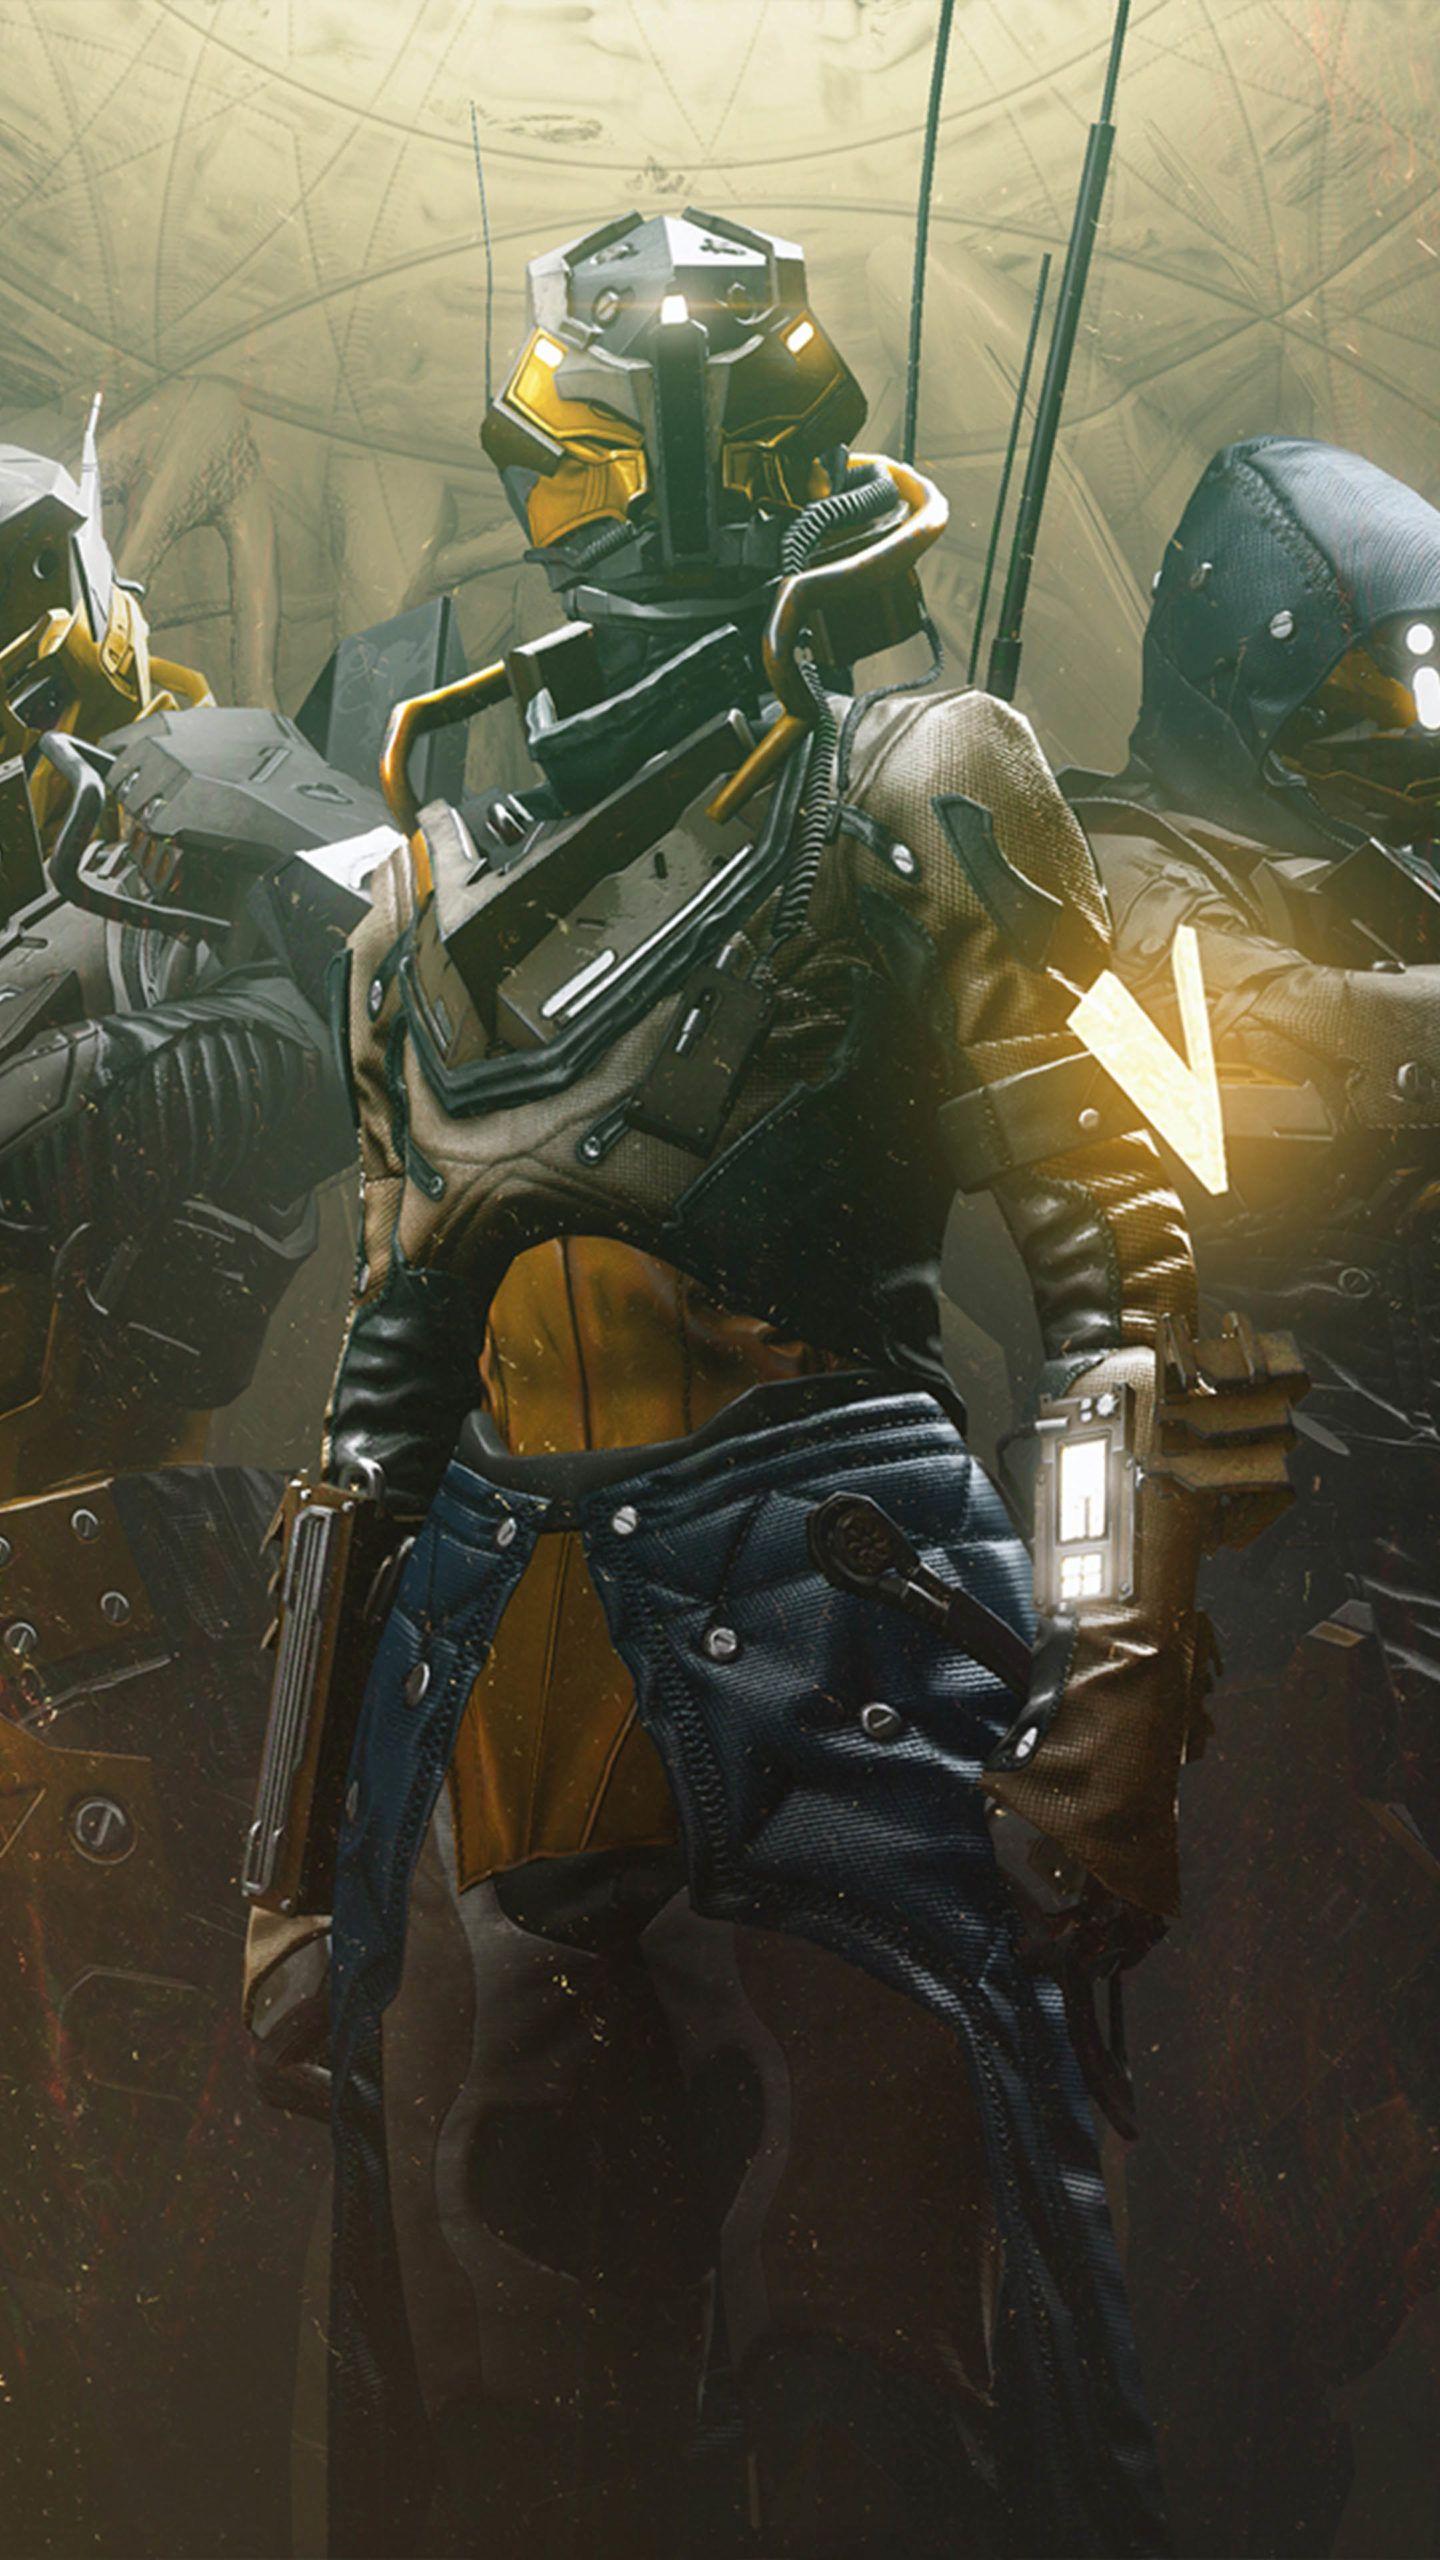 Destiny 2 Season Of Arrival 2020 4k Ultra Hd Mobile Wallpaper In 2021 Marvel Artwork Steampunk Armor Destiny